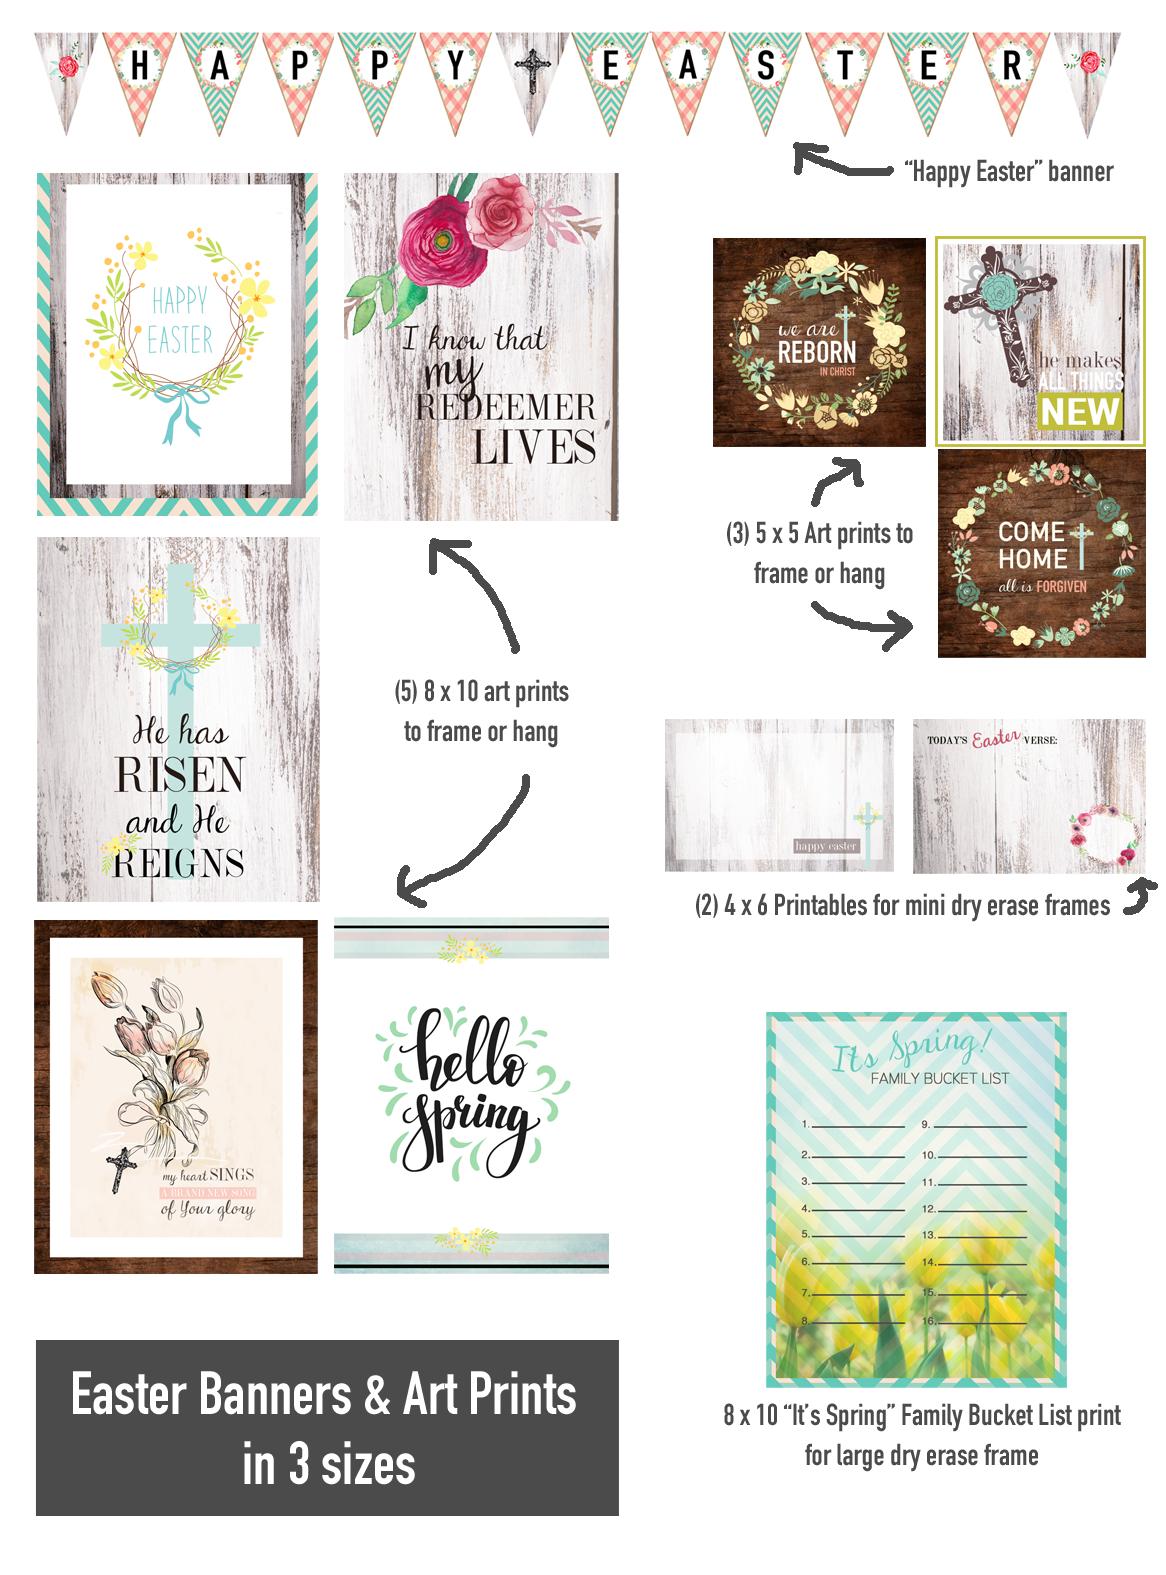 30+ Free Easter Home Decor Printables - Christ Centered Holidays - Free Printable Christian Art